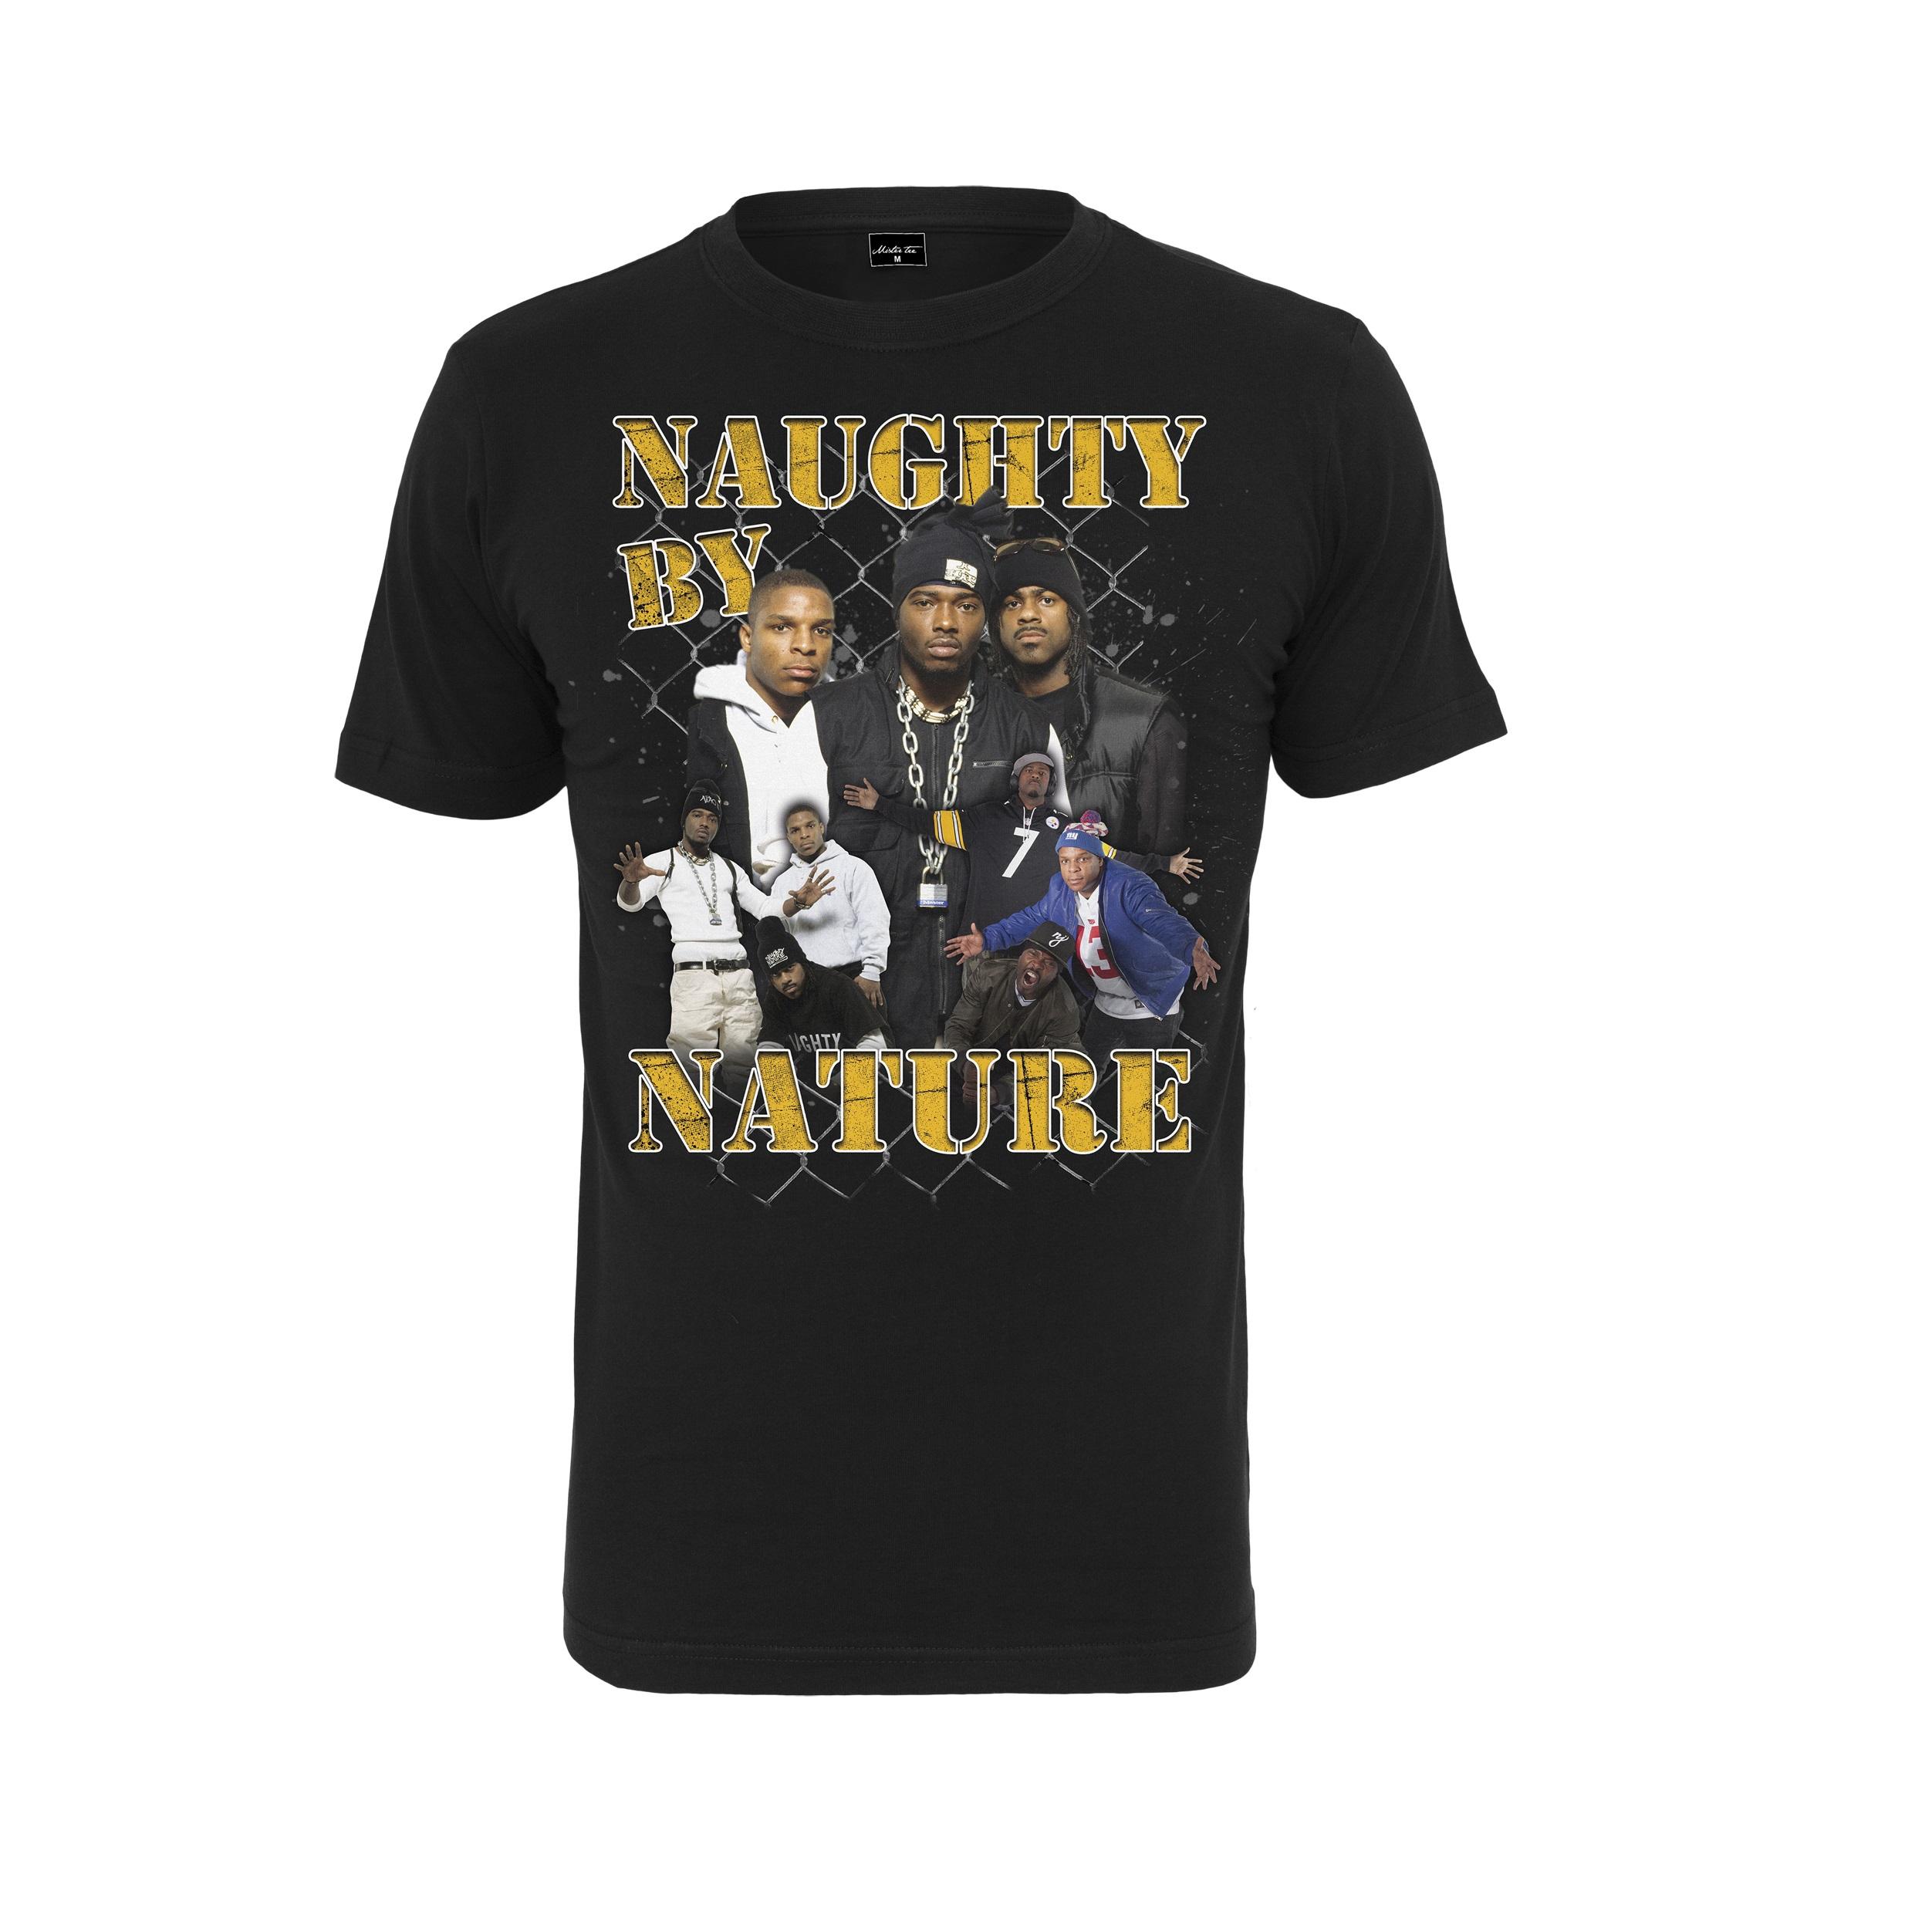 Naughty By Nature - Tričko 90s Tee - Muž, Čierna, M